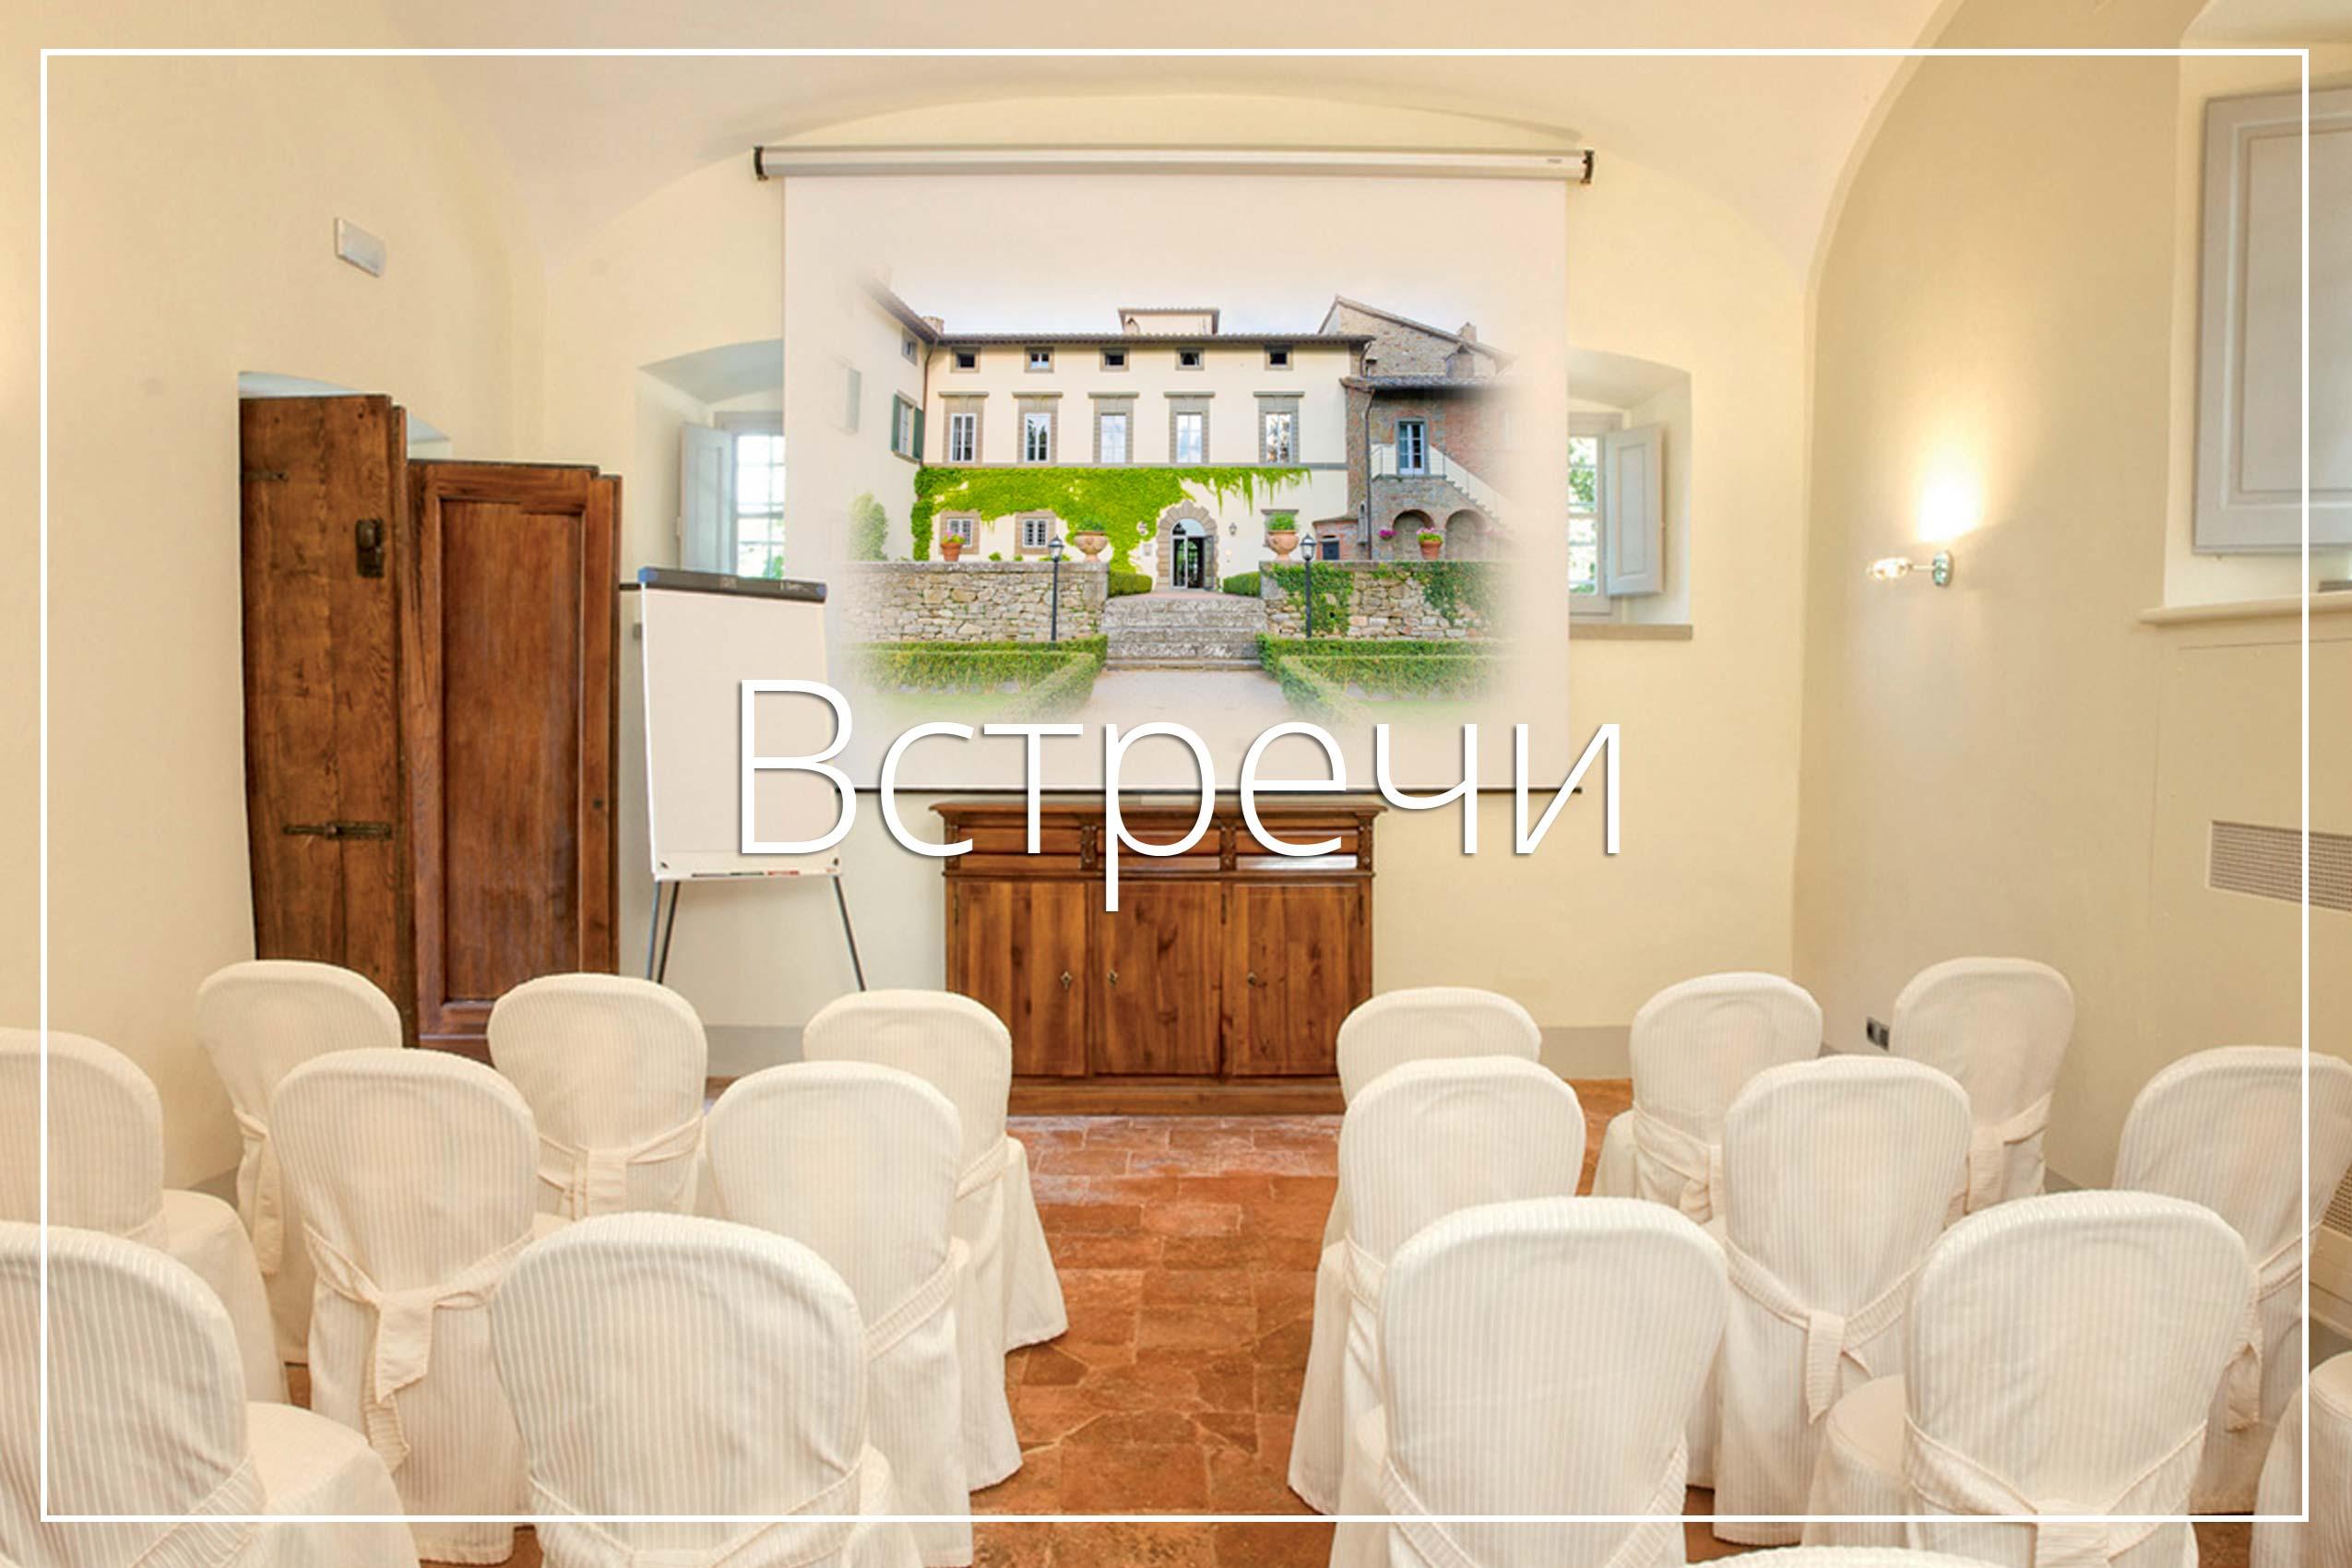 Meeting Room Villa di Piazzano SLH Luxury Hotel Cortona tuscany